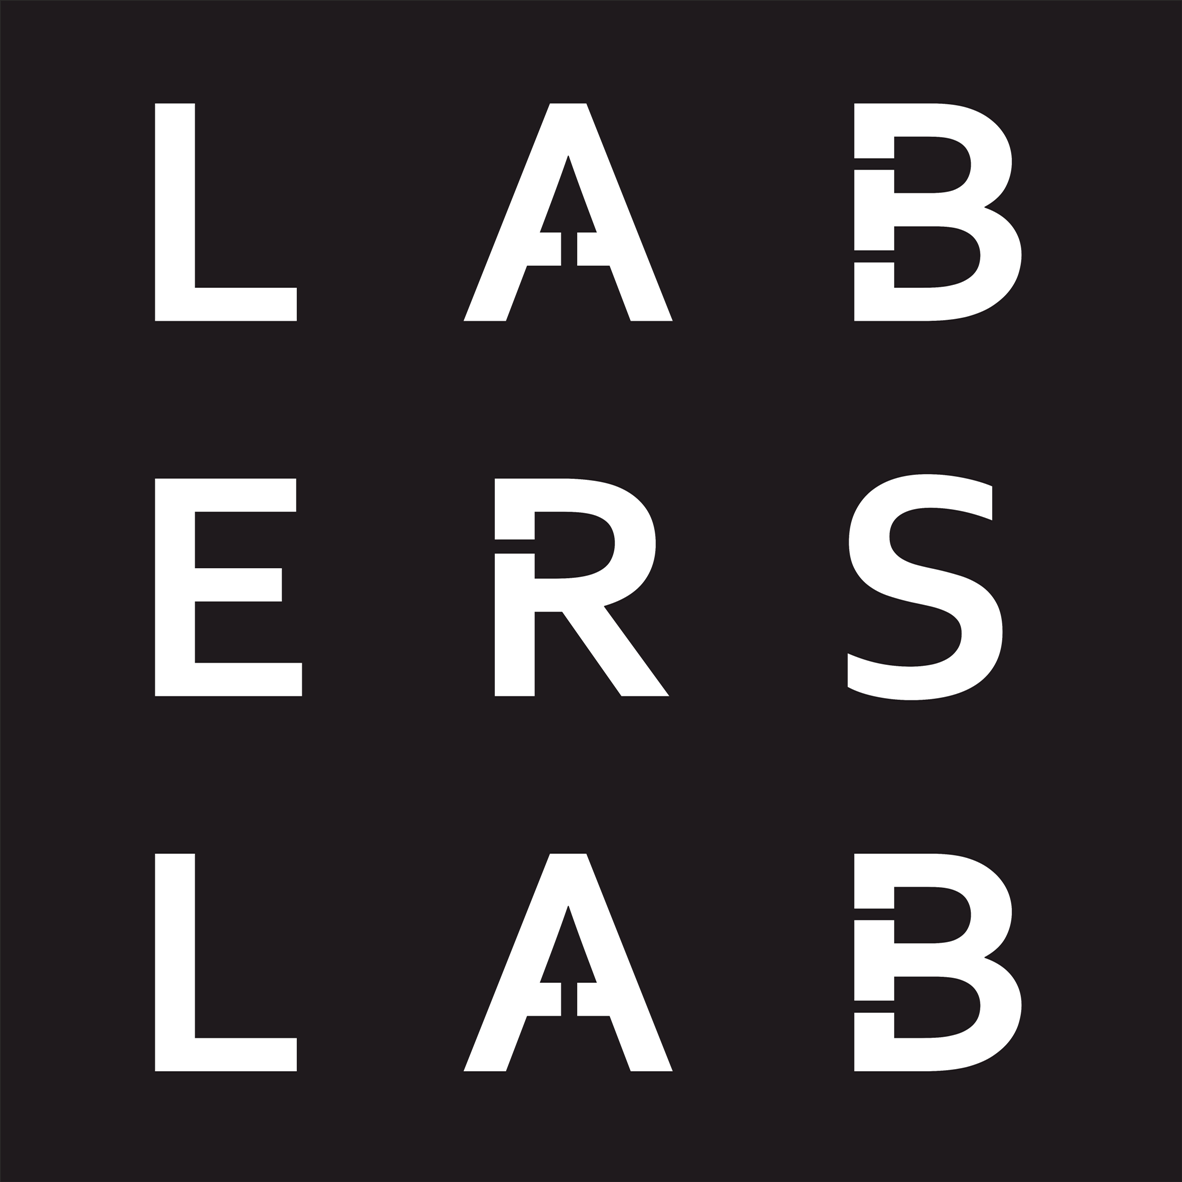 Logo_LAB_ERS_LAB